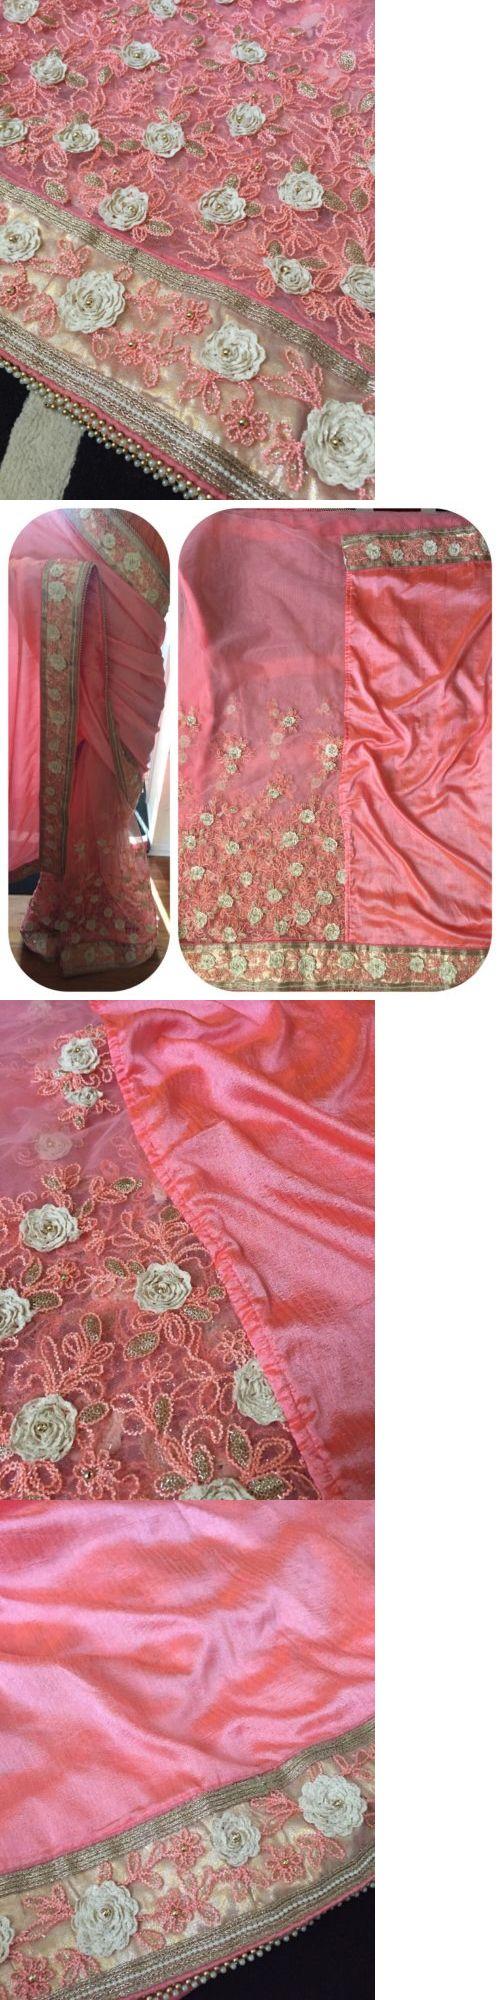 Sari Saree 155250: Designer Party Wear Wedding Indian Pakistani Saree Sari Bollywood Ethnic -> BUY IT NOW ONLY: $114 on eBay!